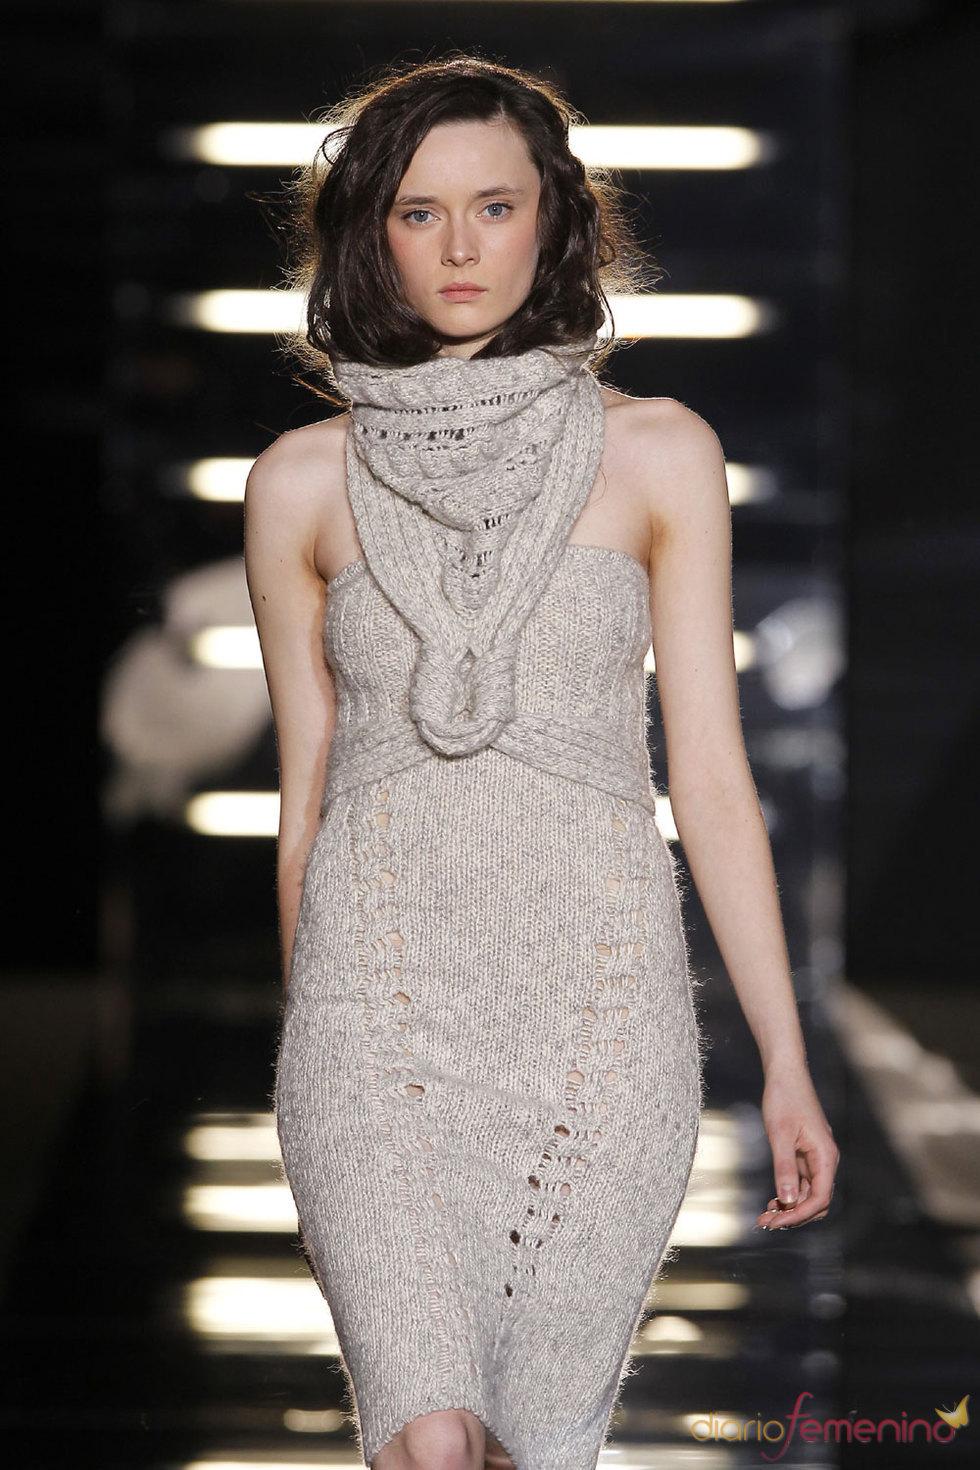 Vestido de tricot de Sita Murt - Pasarela Cibeles 2010